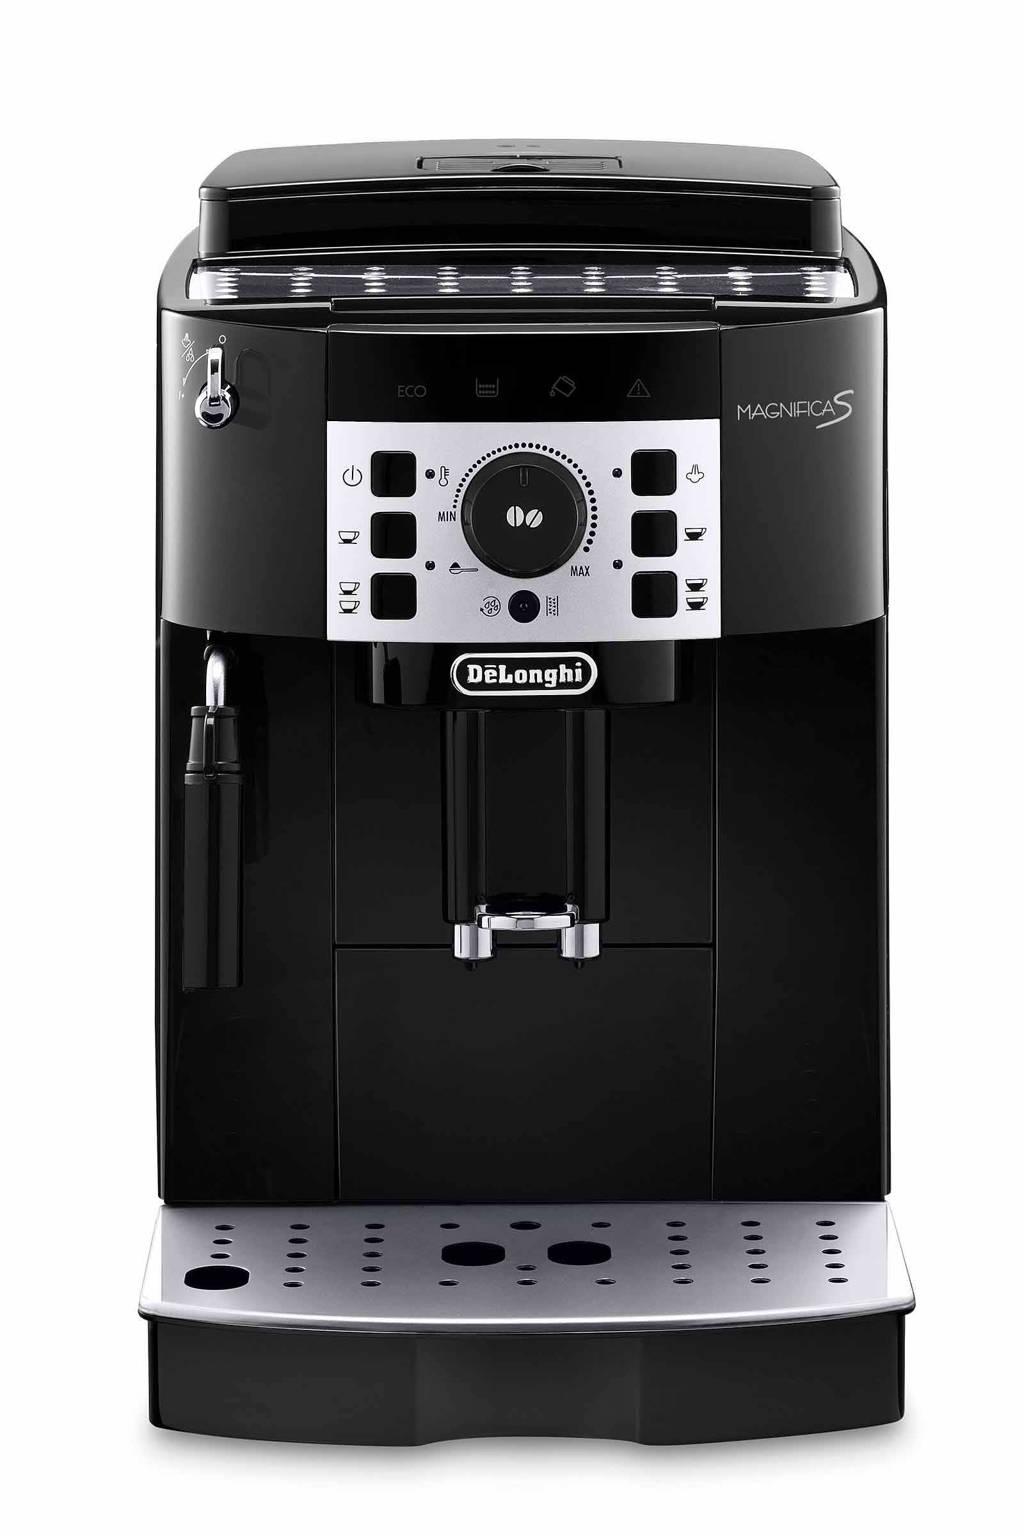 DeLonghi ECAM20.110.B koffiemachine, Zwart